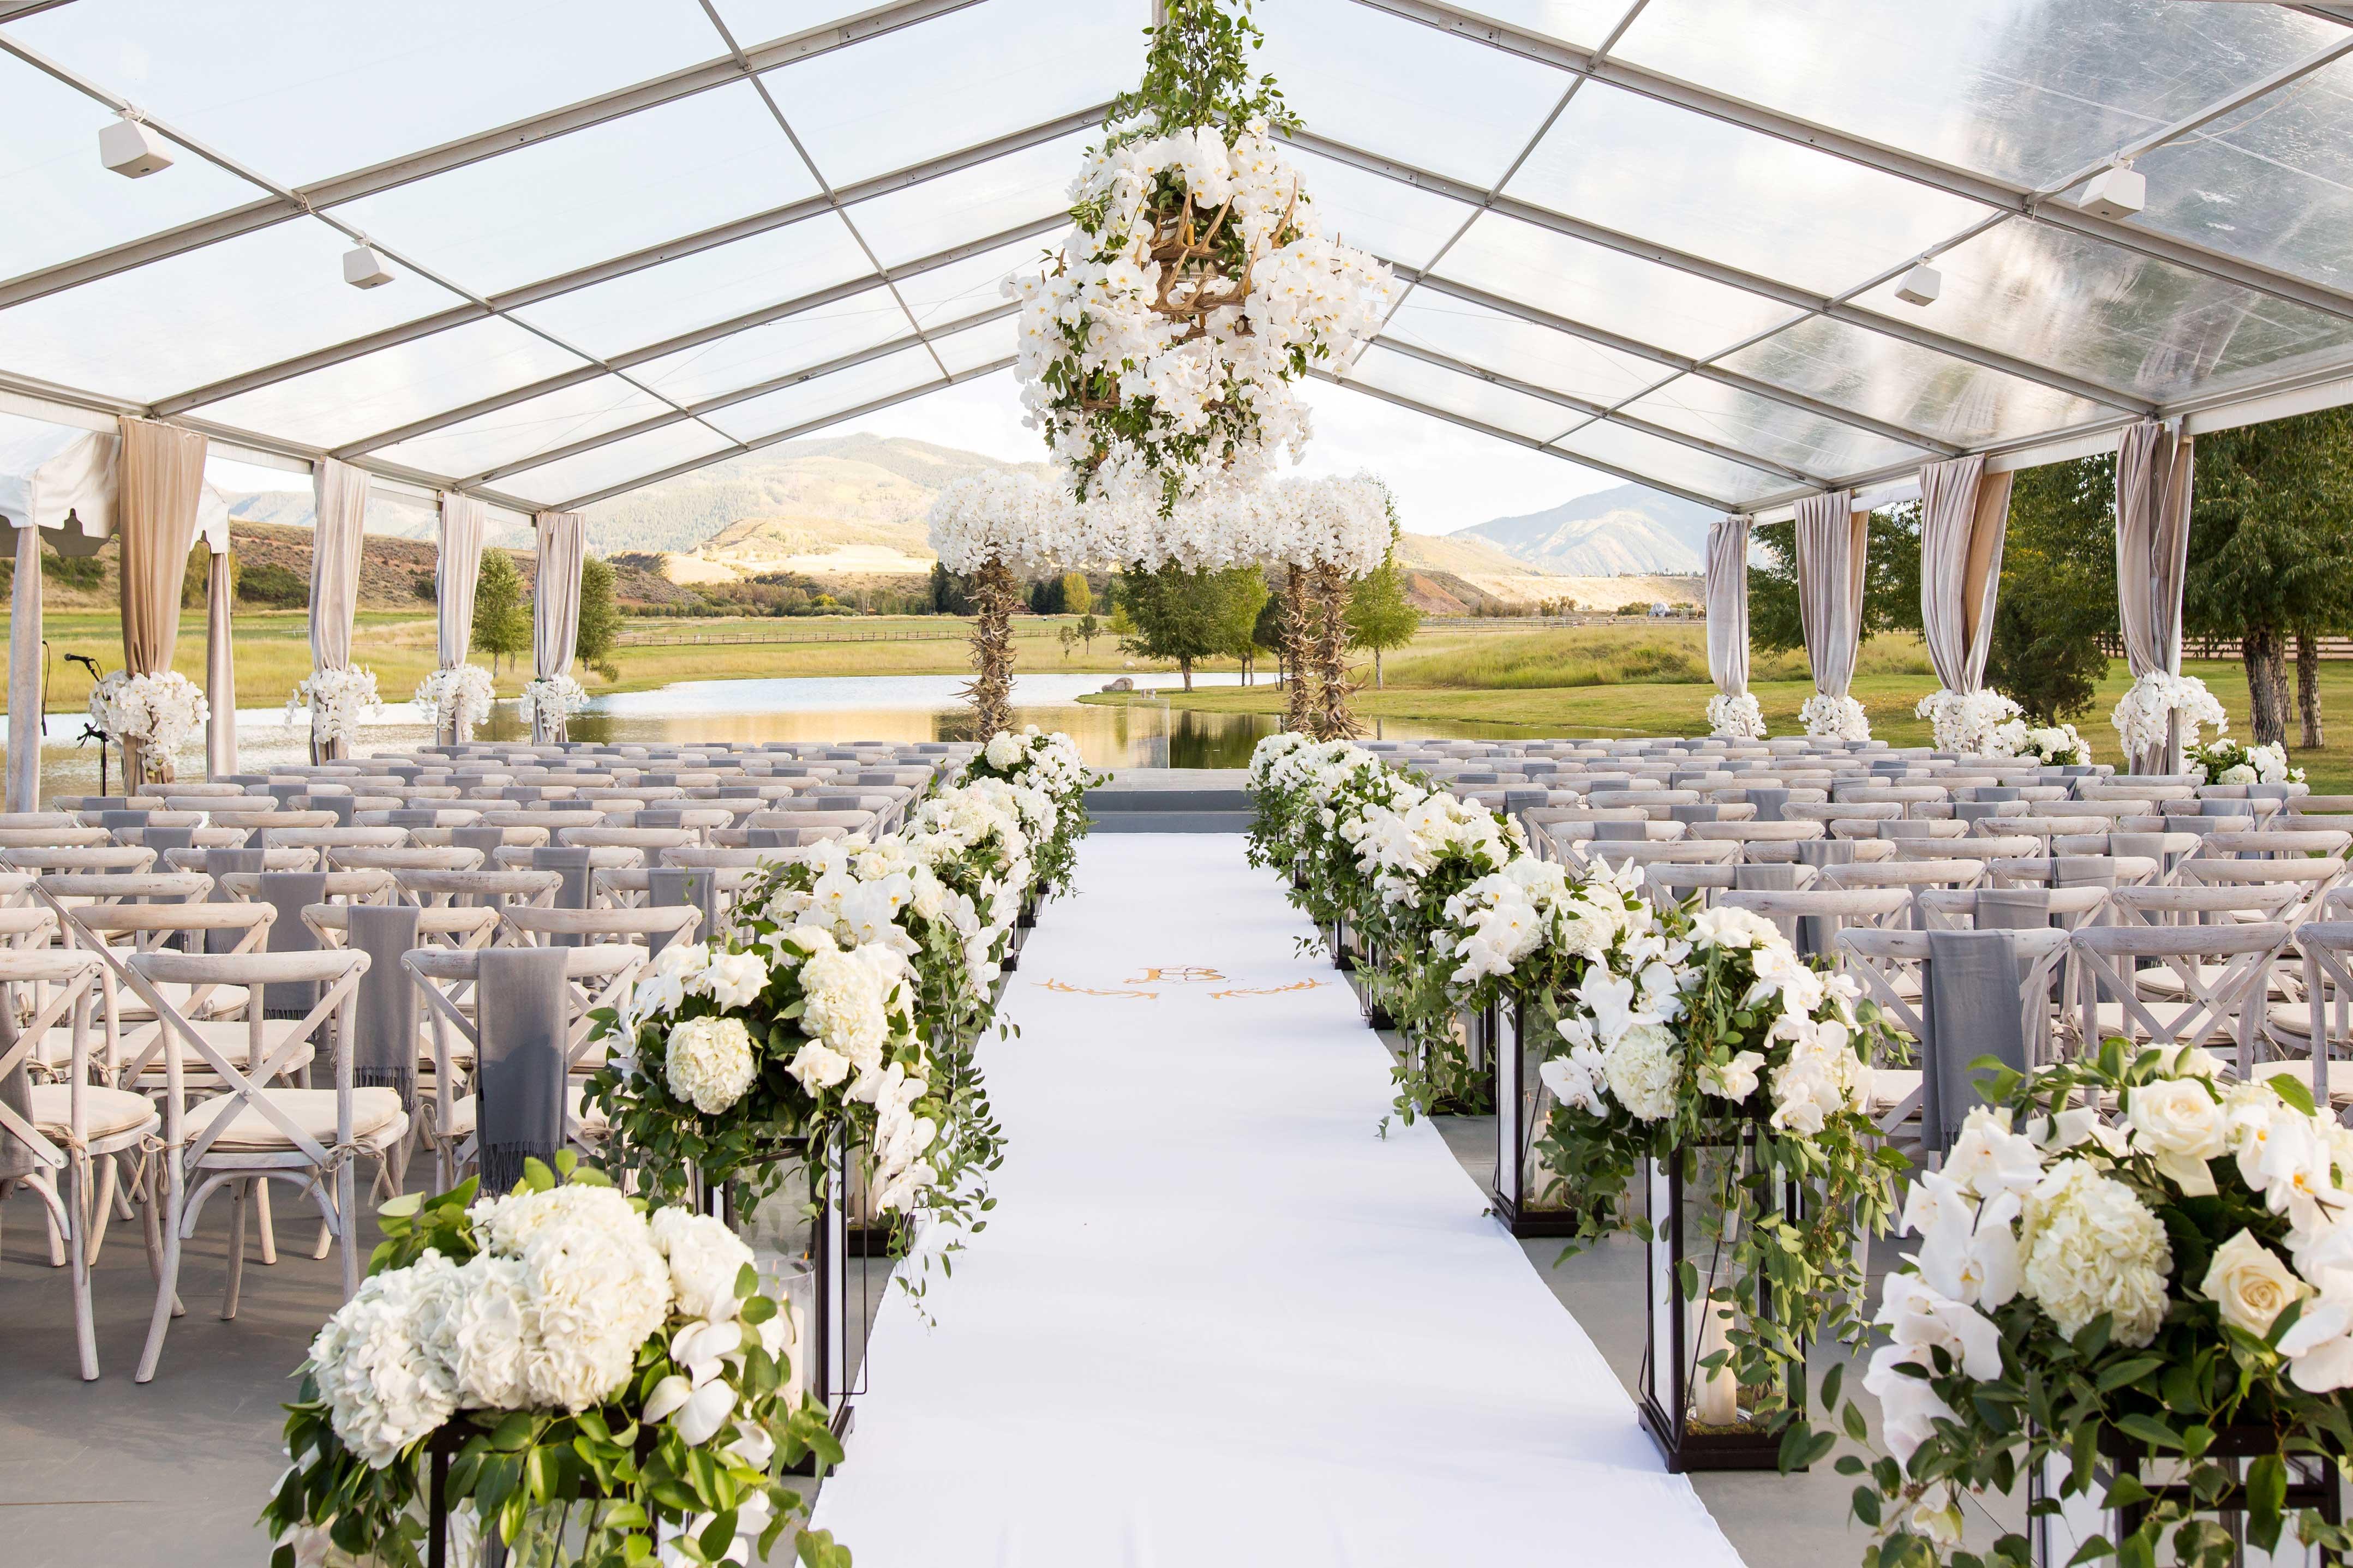 tent outdoor wedding ceremony colorado pretty mountain view 2019 most popular real weddings